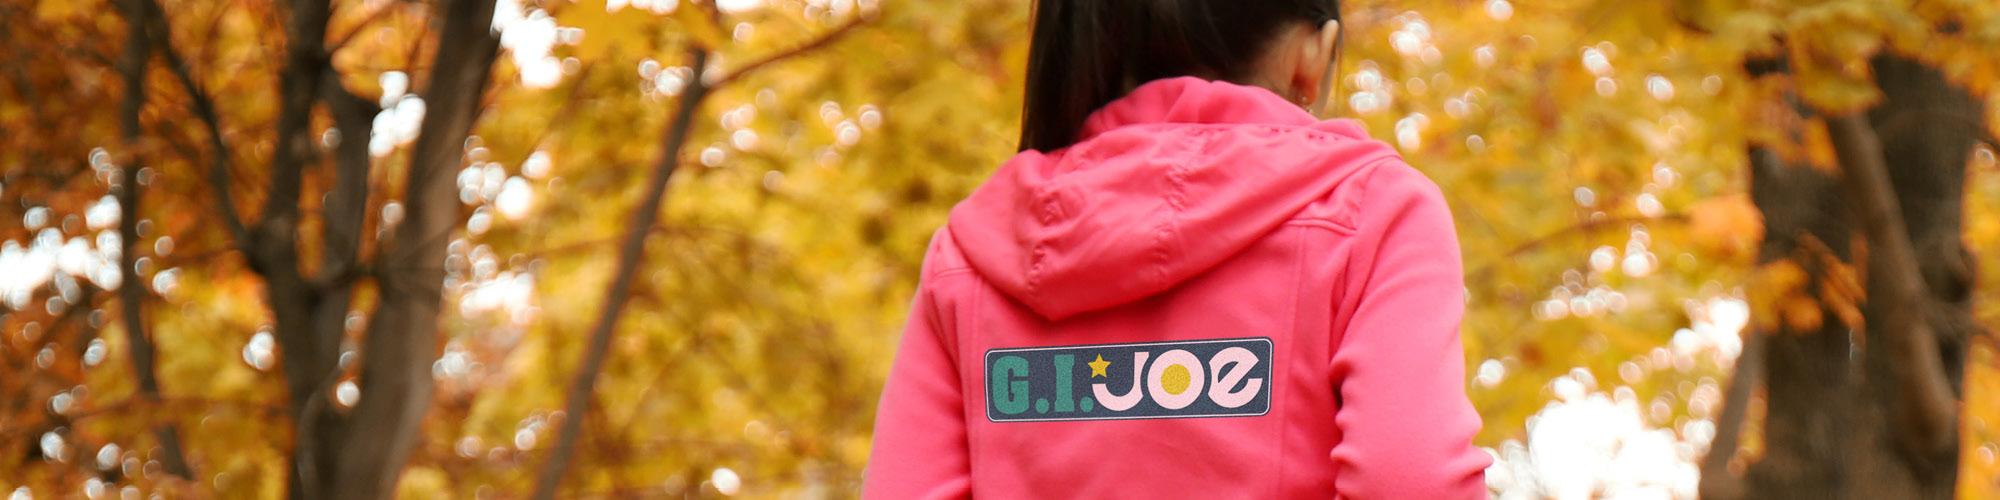 Joe gijoe caroussel 9